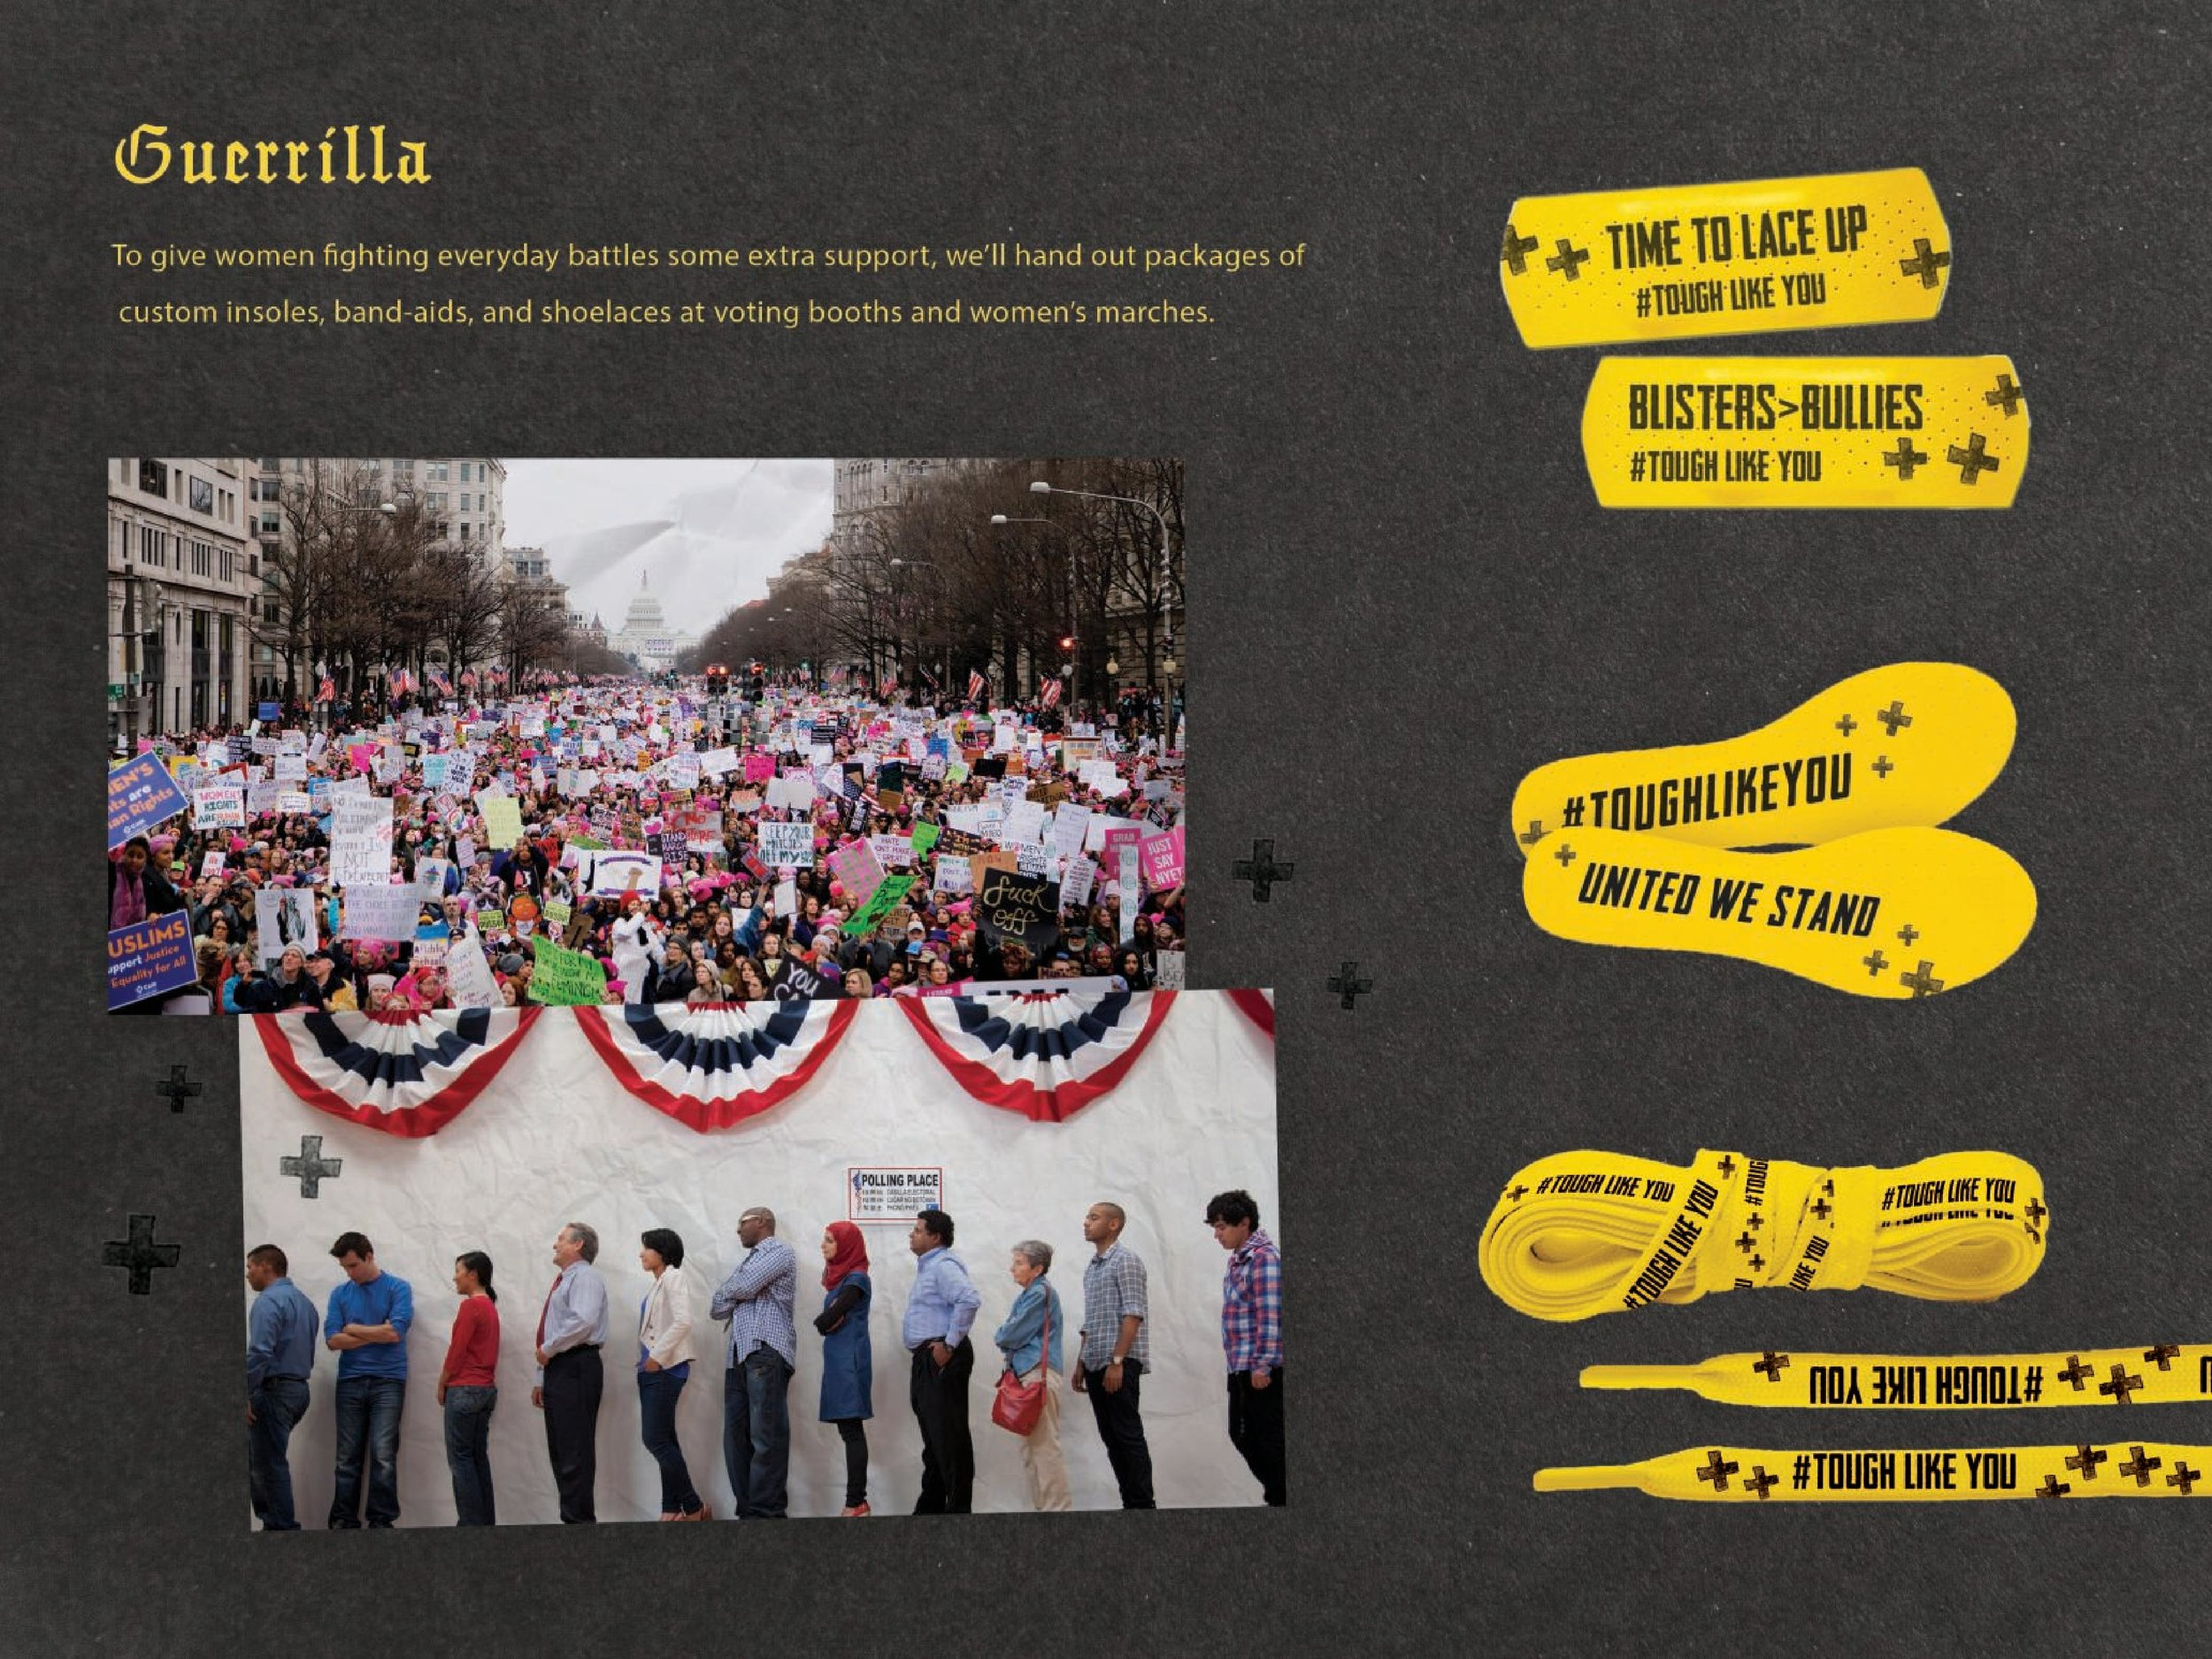 guerrilla (wecompress.com)-page-001.jpg